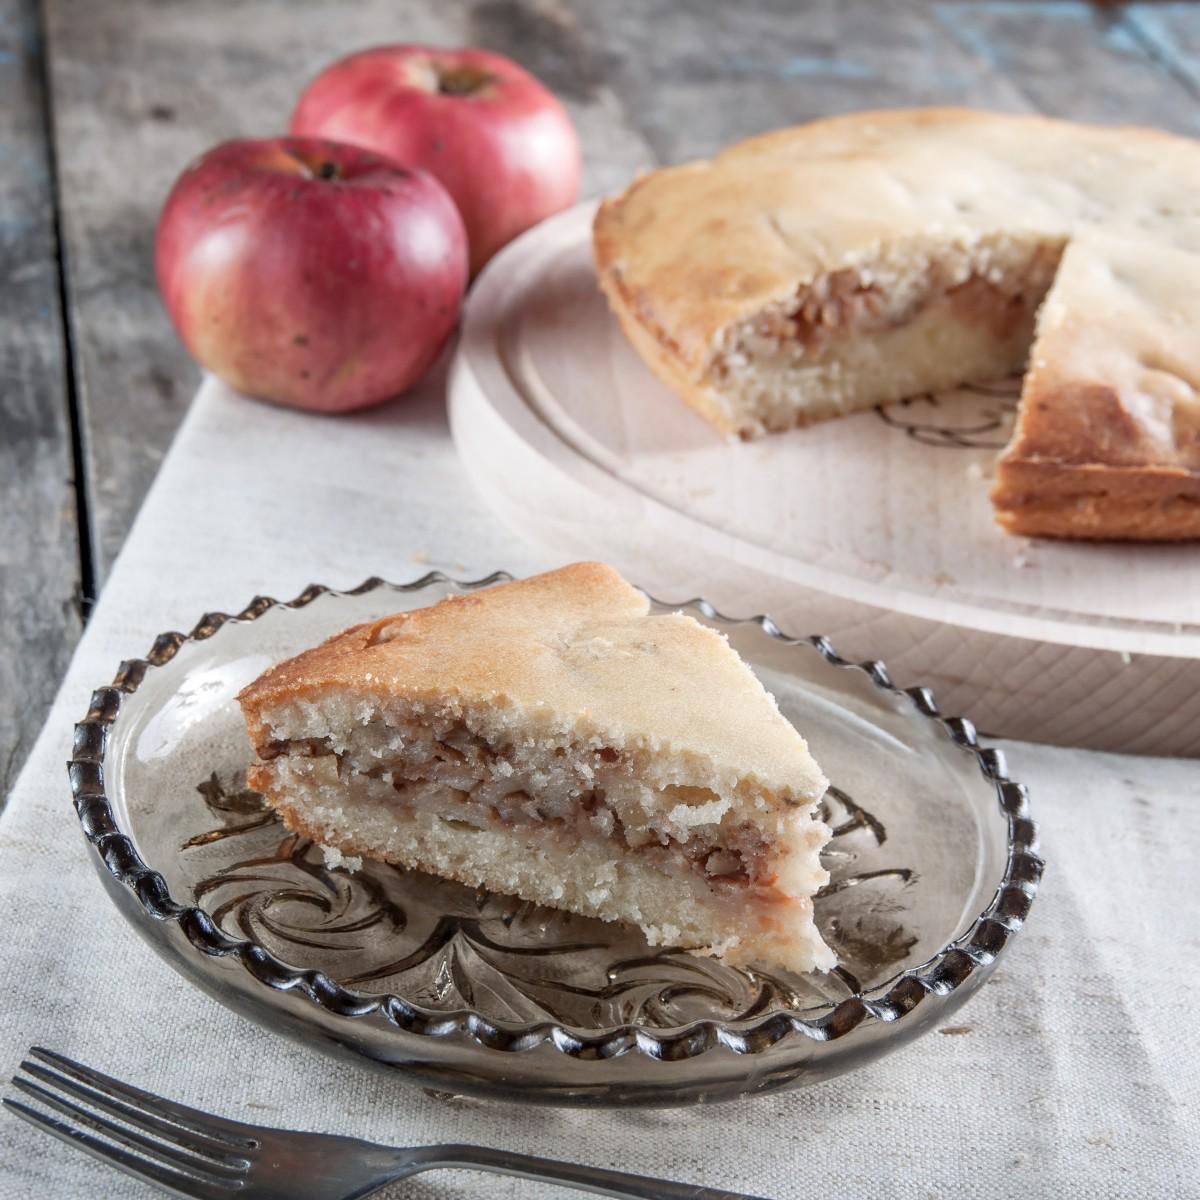 Scrumptious Homemade Apple Pie | Amazing Photos